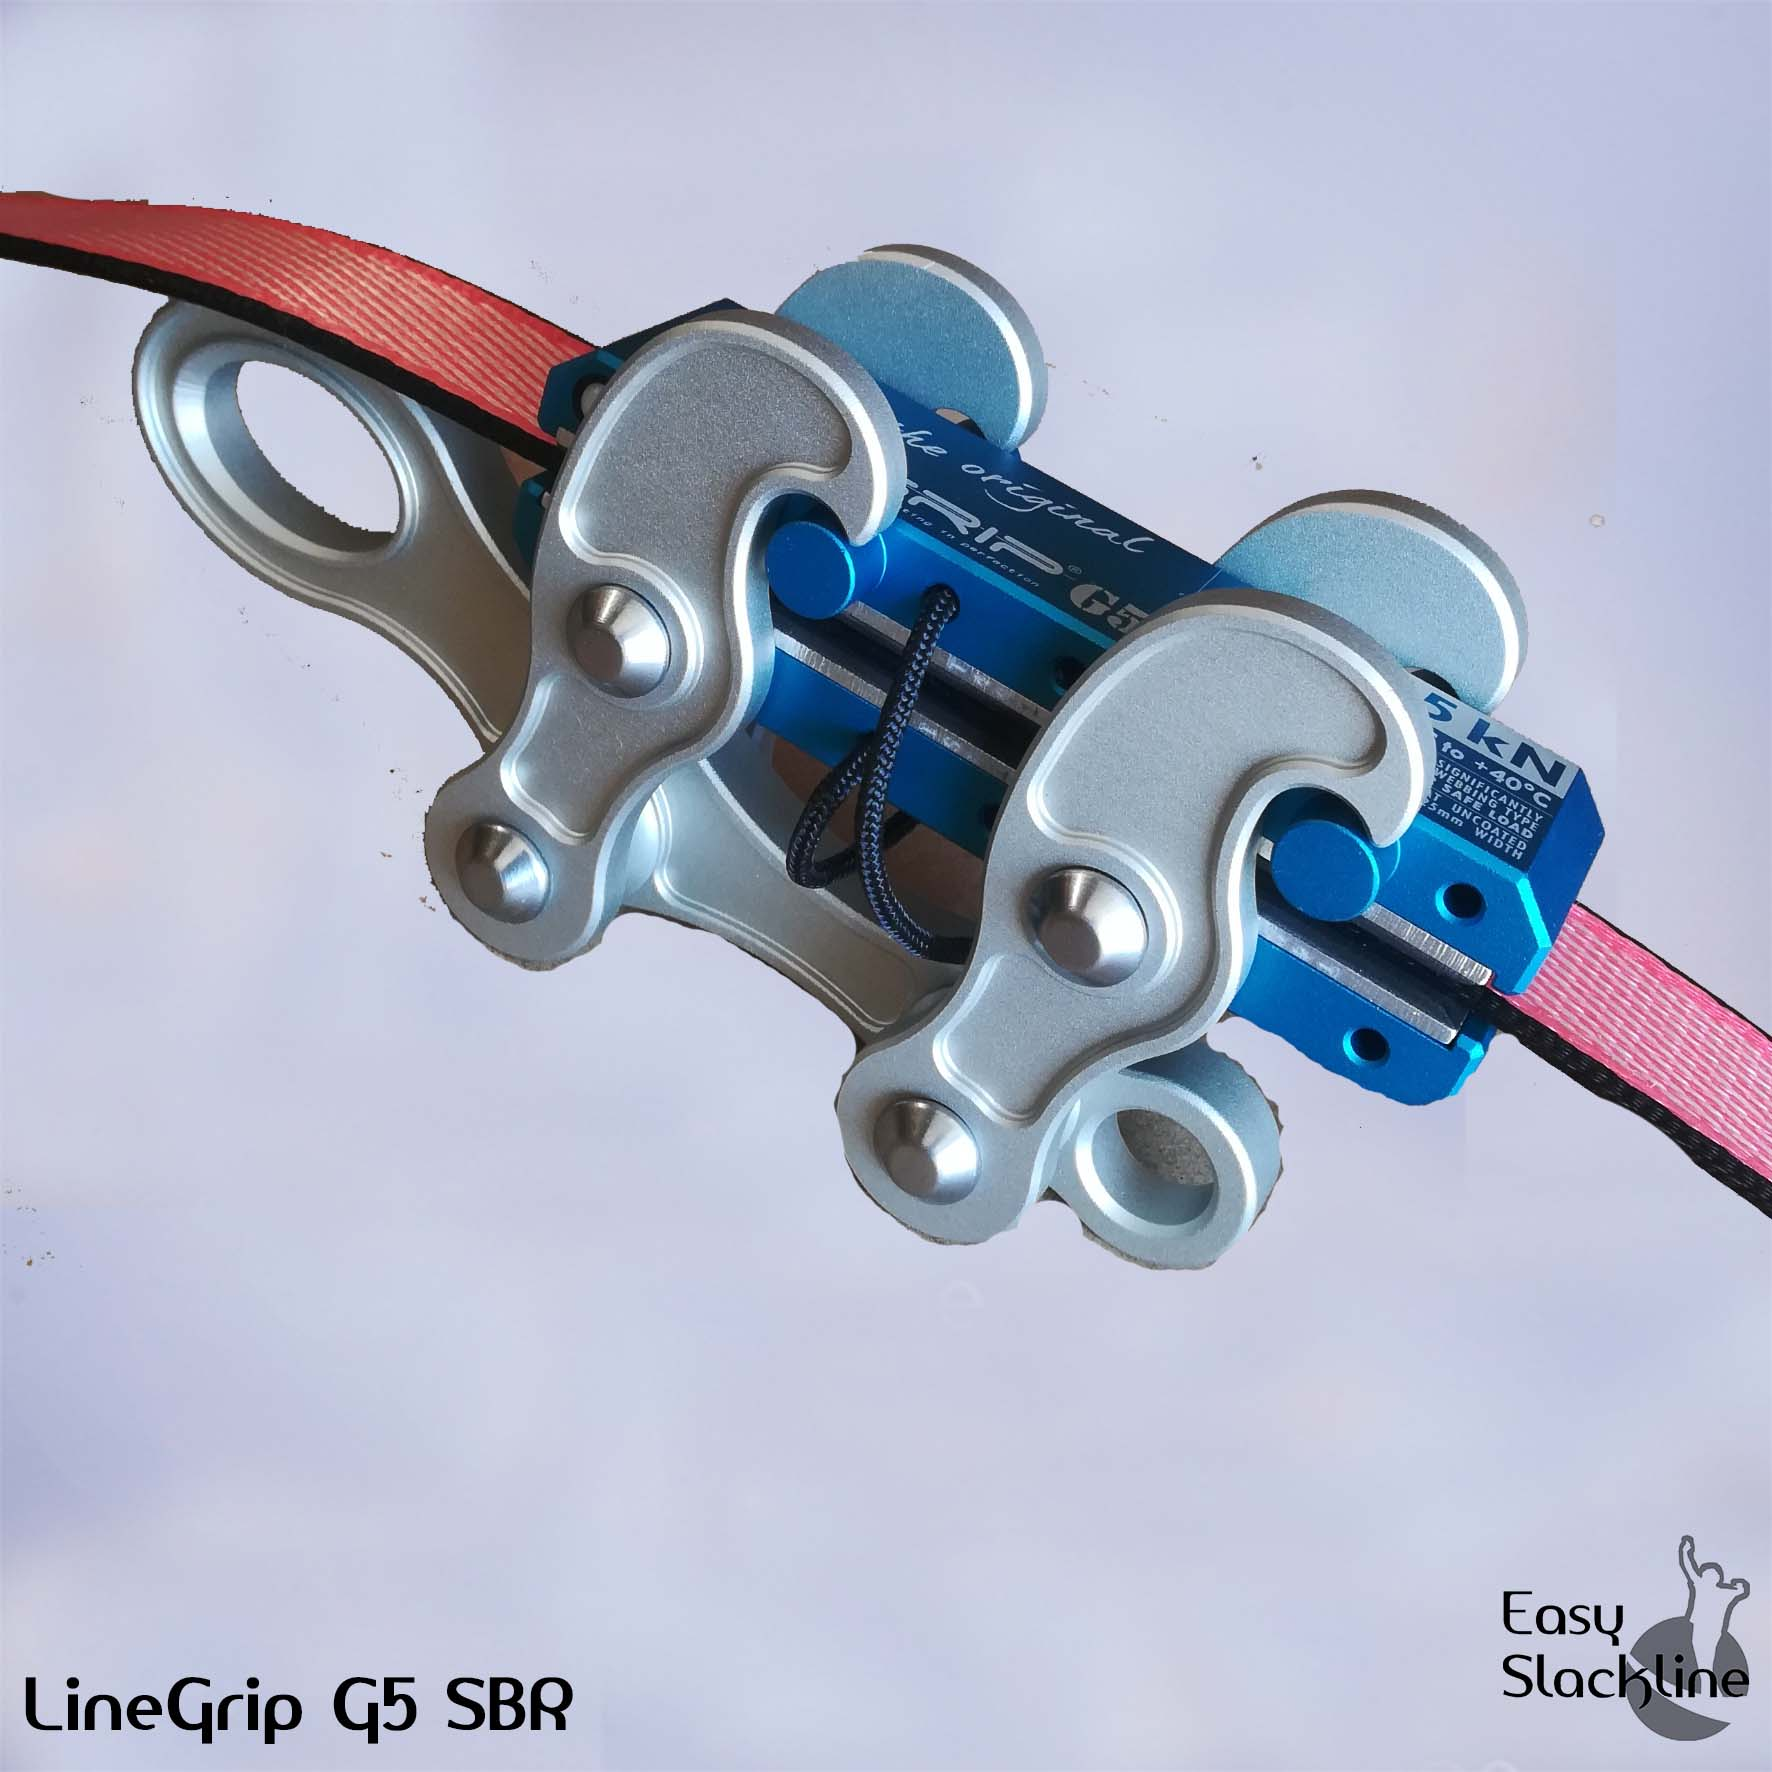 linegrip easy slackline